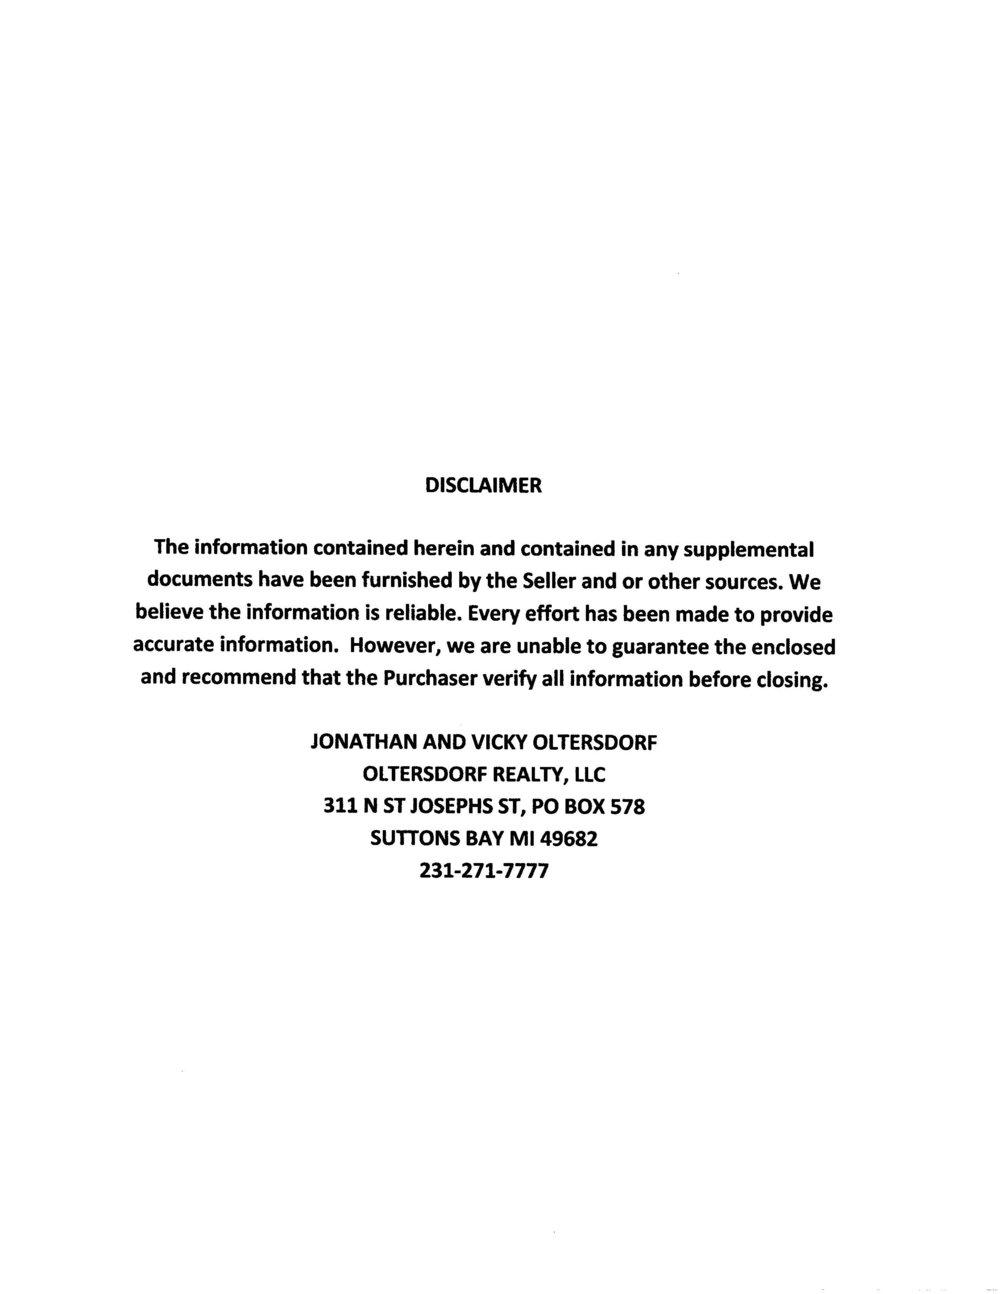 2091 S Lake Shore Drive - Oltersdorf Realty LLC Marketing Packet_Page_14.jpg